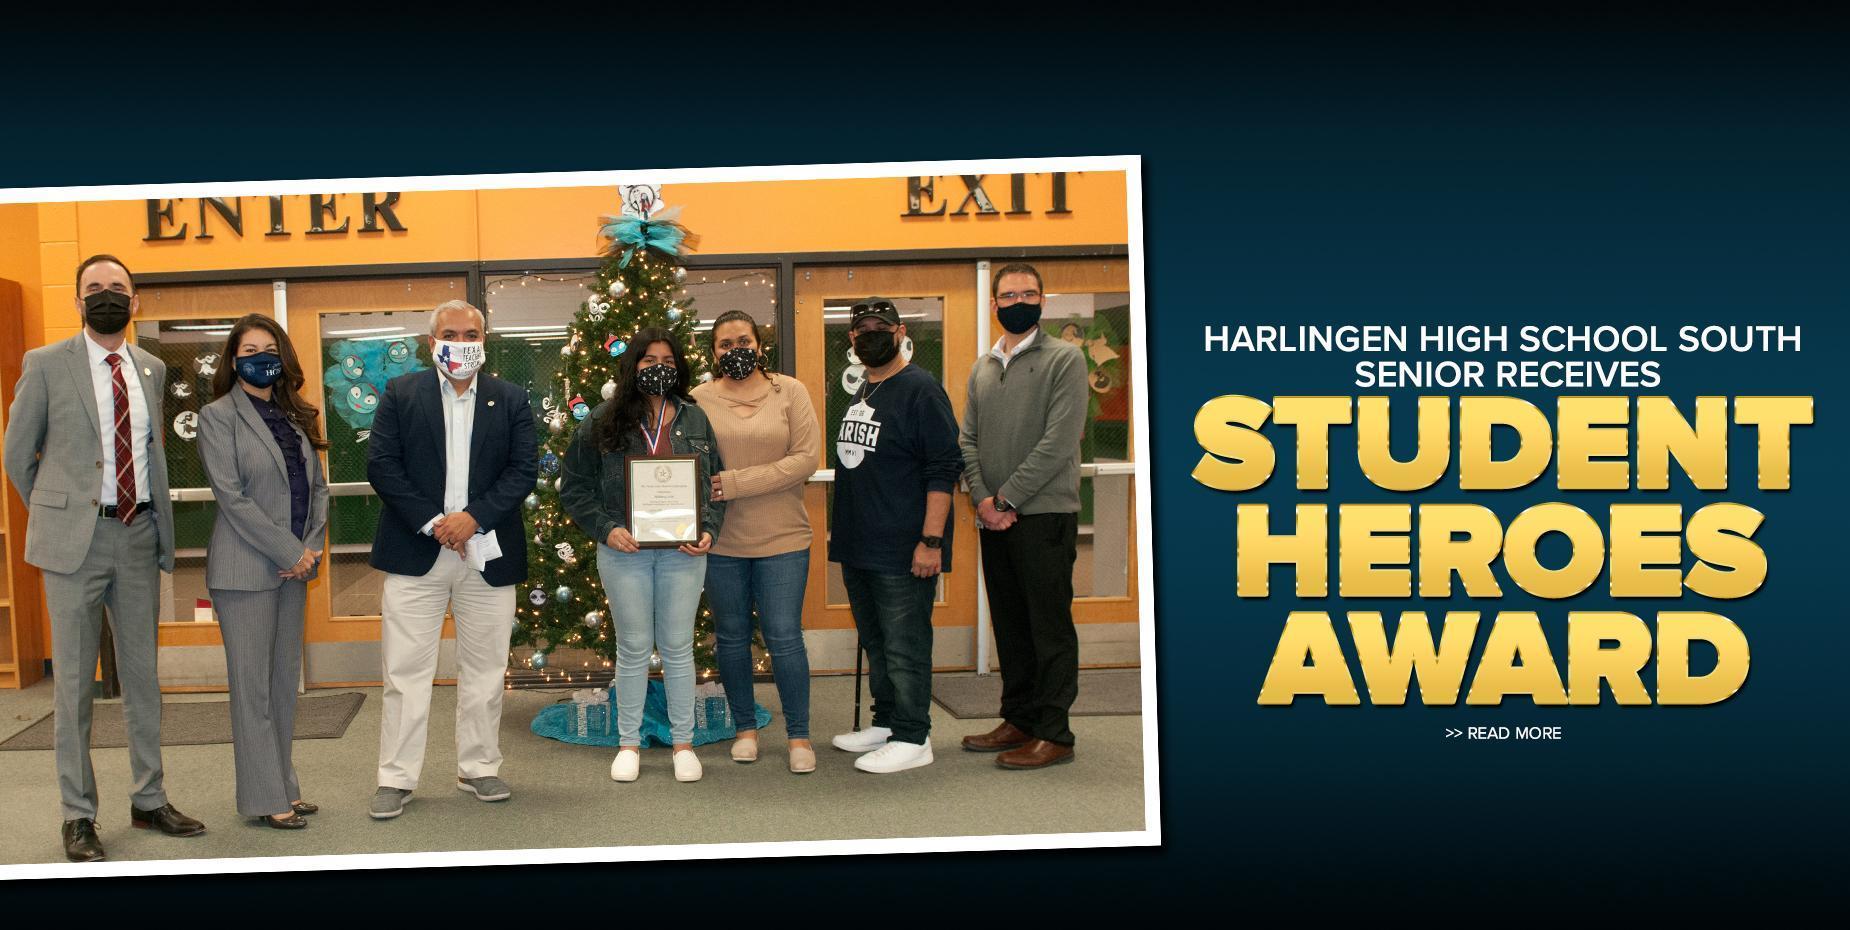 Harlingen High School South senior receives Student Heroes Award